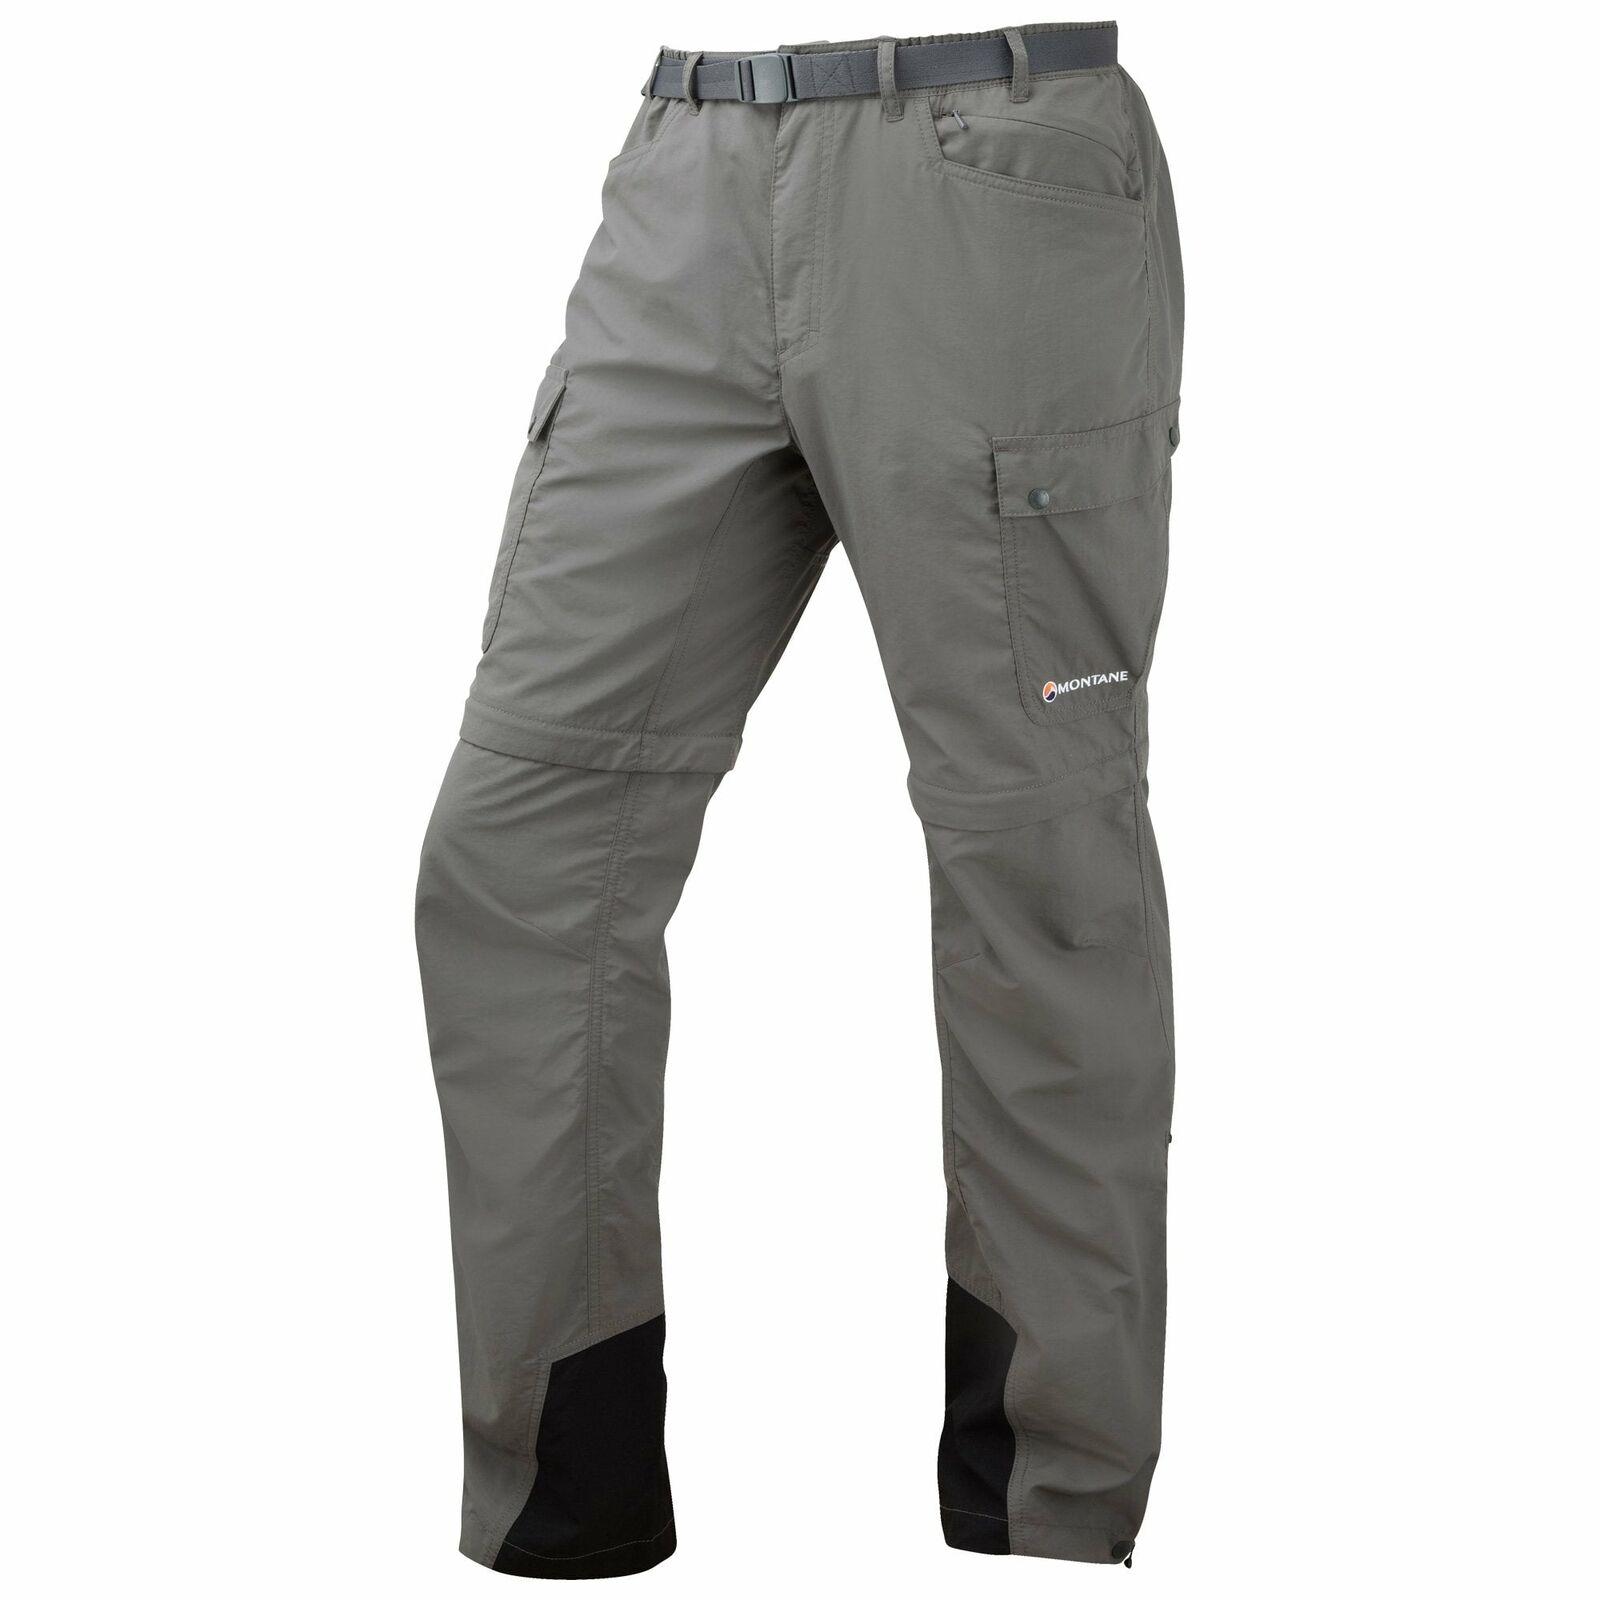 MONTANE Pantalon Terra GT conGrünit